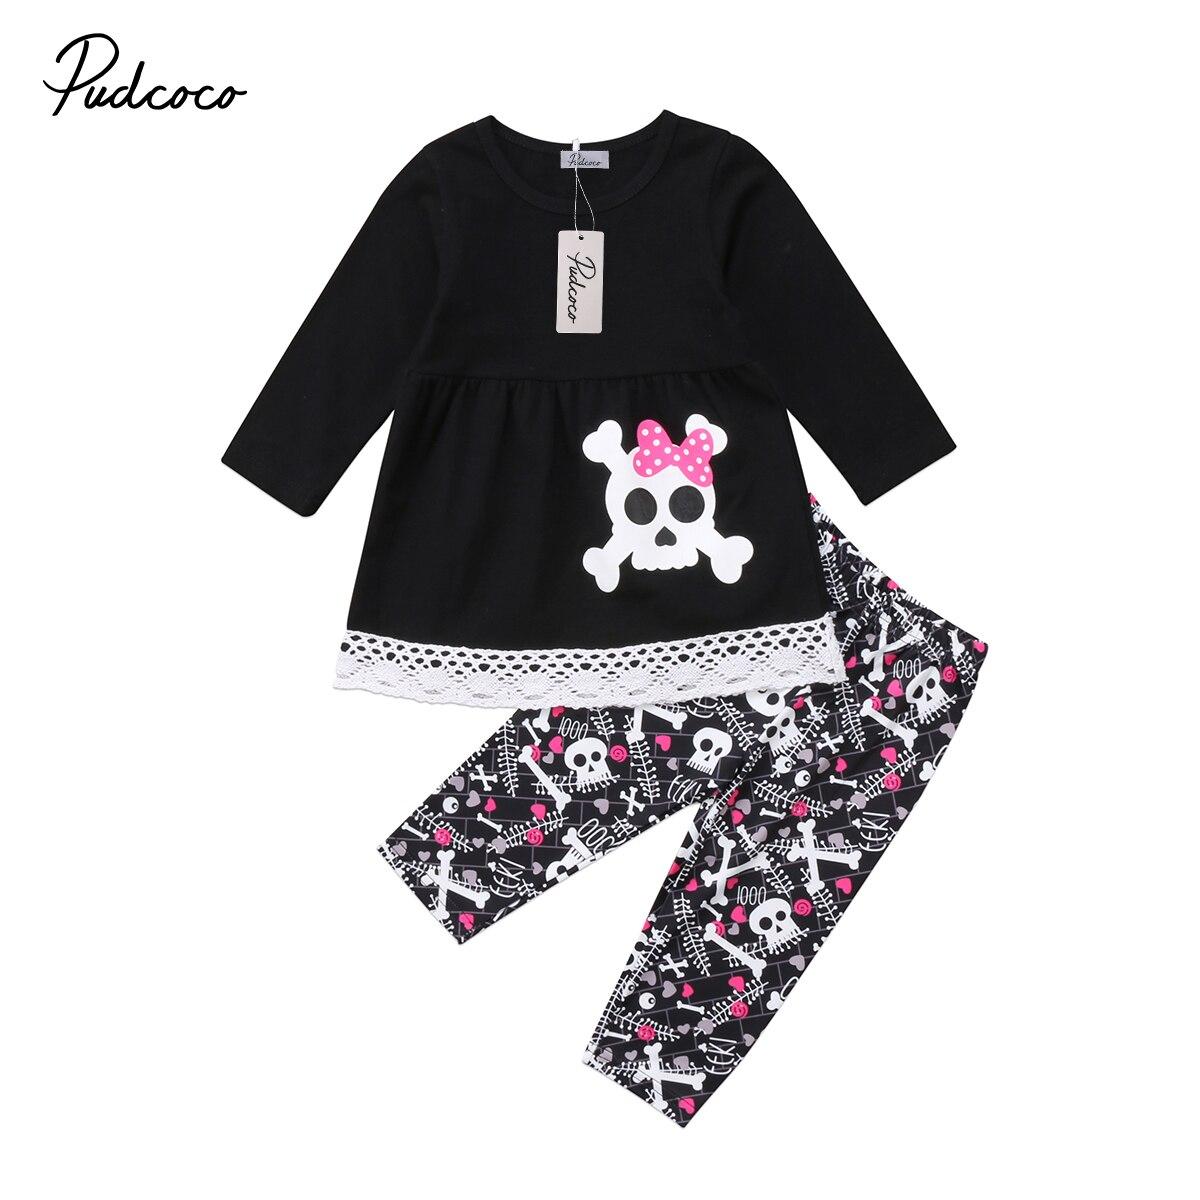 2Pcs Kids Girls Clothing Toddler Kids Baby Girl Long sleeve Top T-Shirts Dress Long Pants Leggings Outfit Set Clothes 1-7T